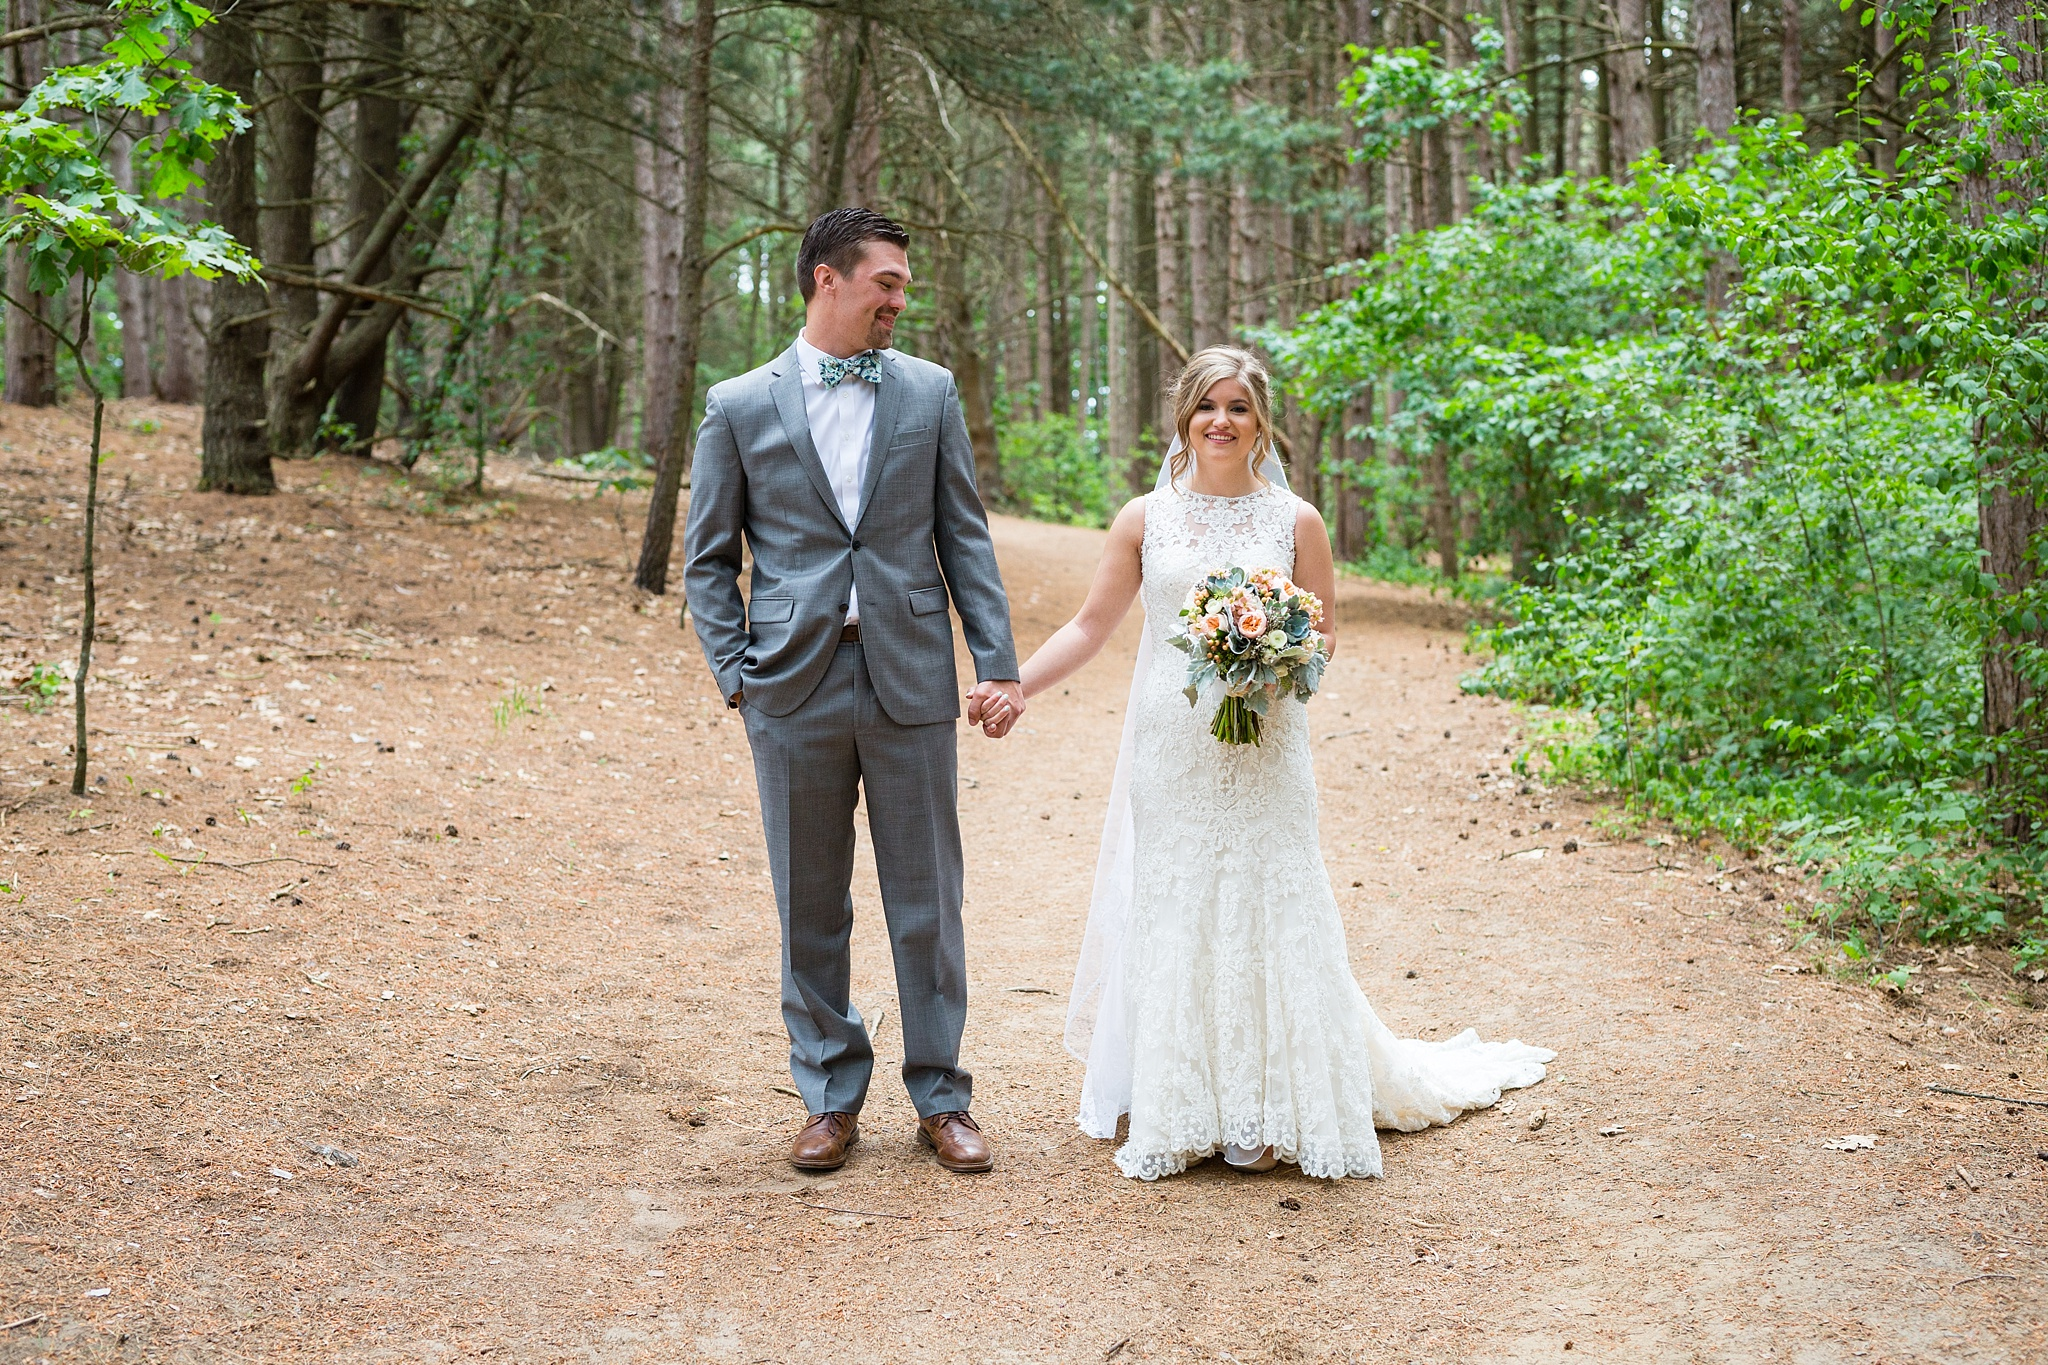 Mandi_Jack_Treehouse_Grand_Rapids_Wedding_0023.jpg